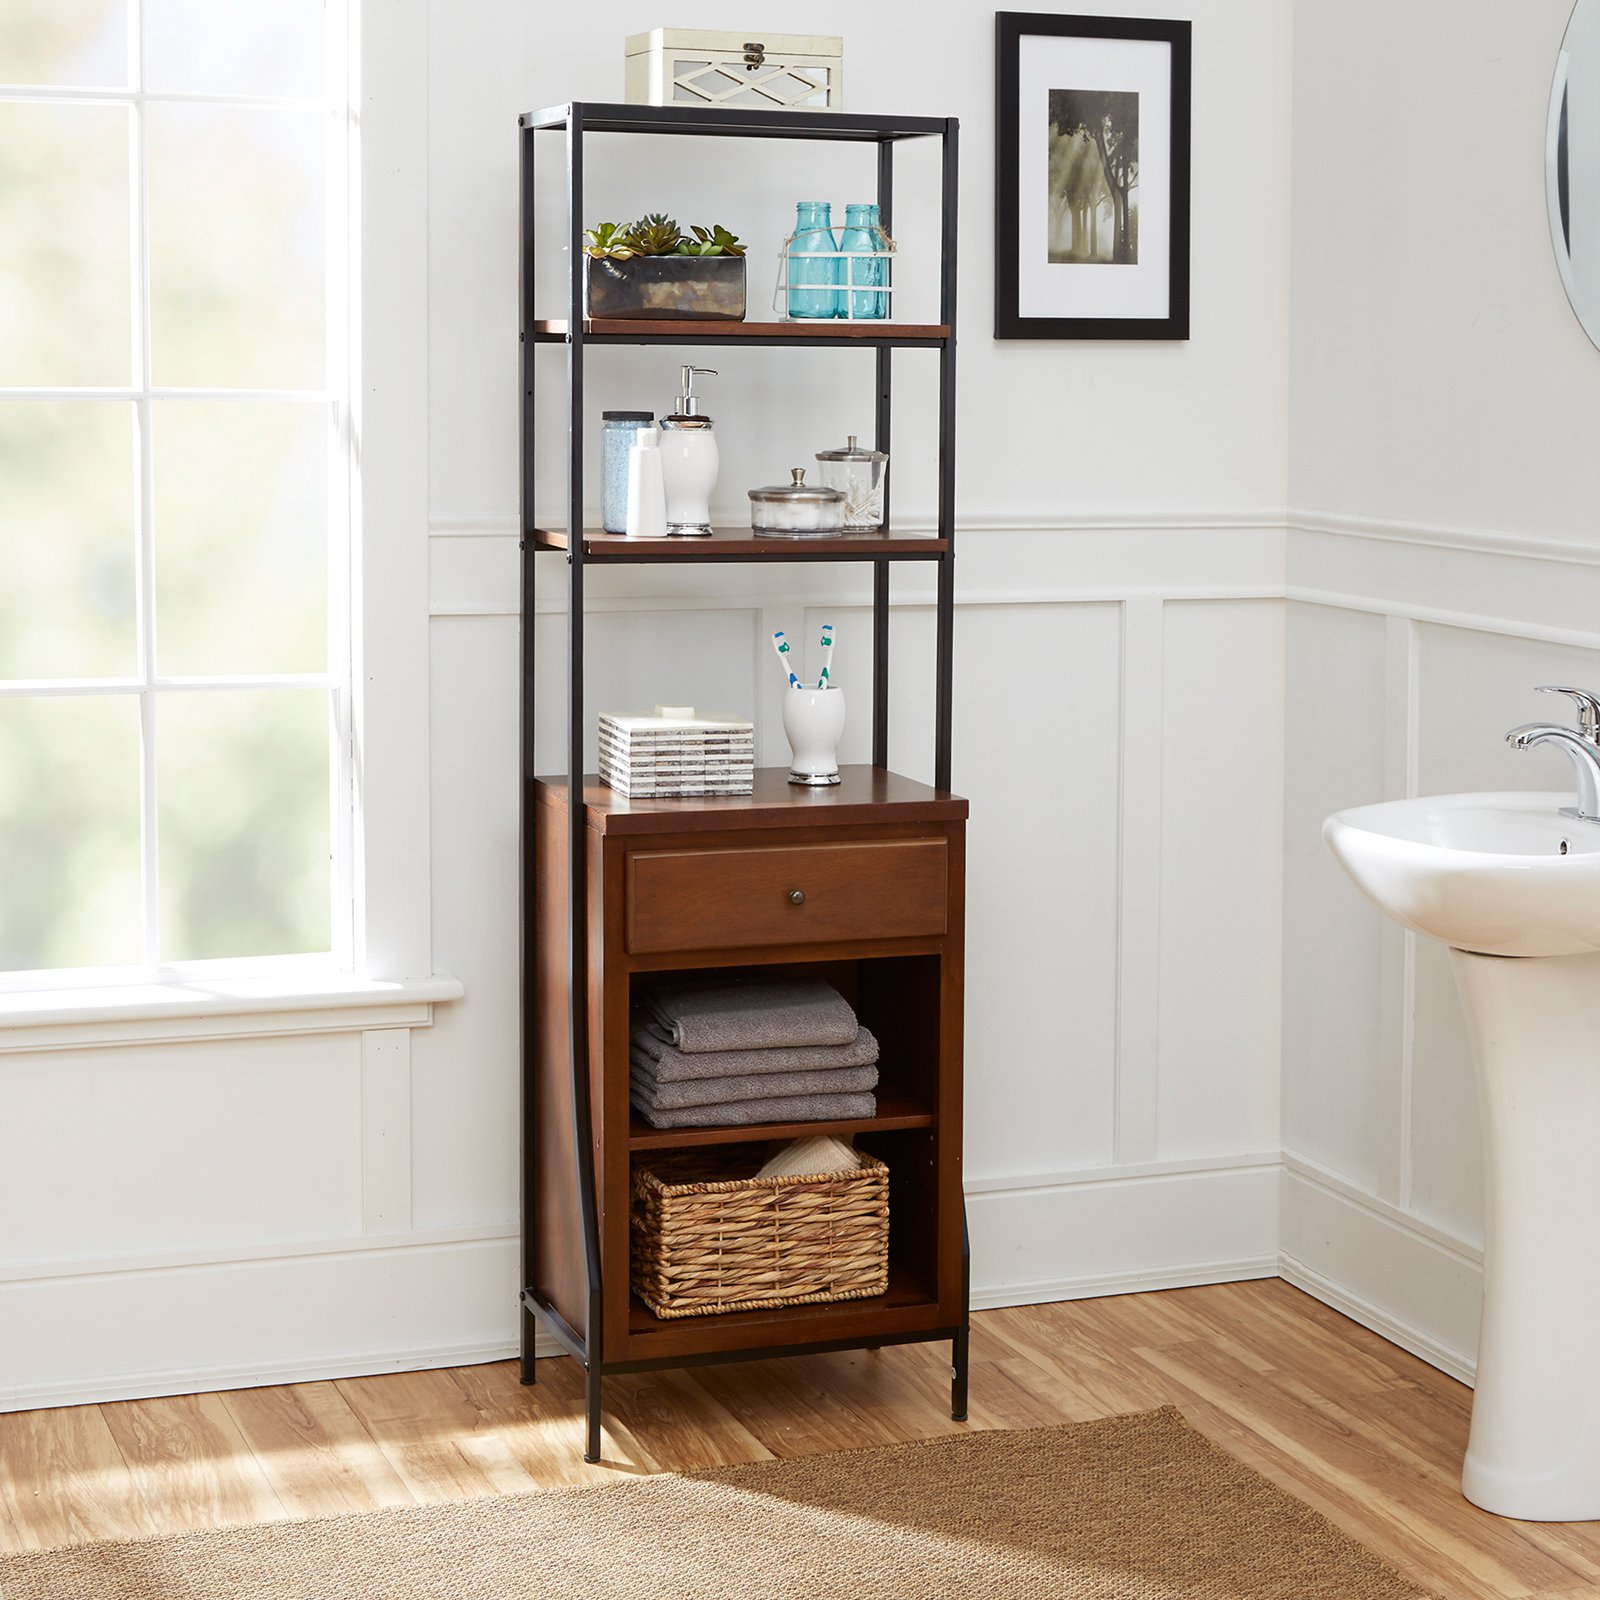 Countertop Shel White Bathroom Base Tower Pedestal Counter regarding dimensions 1600 X 1600